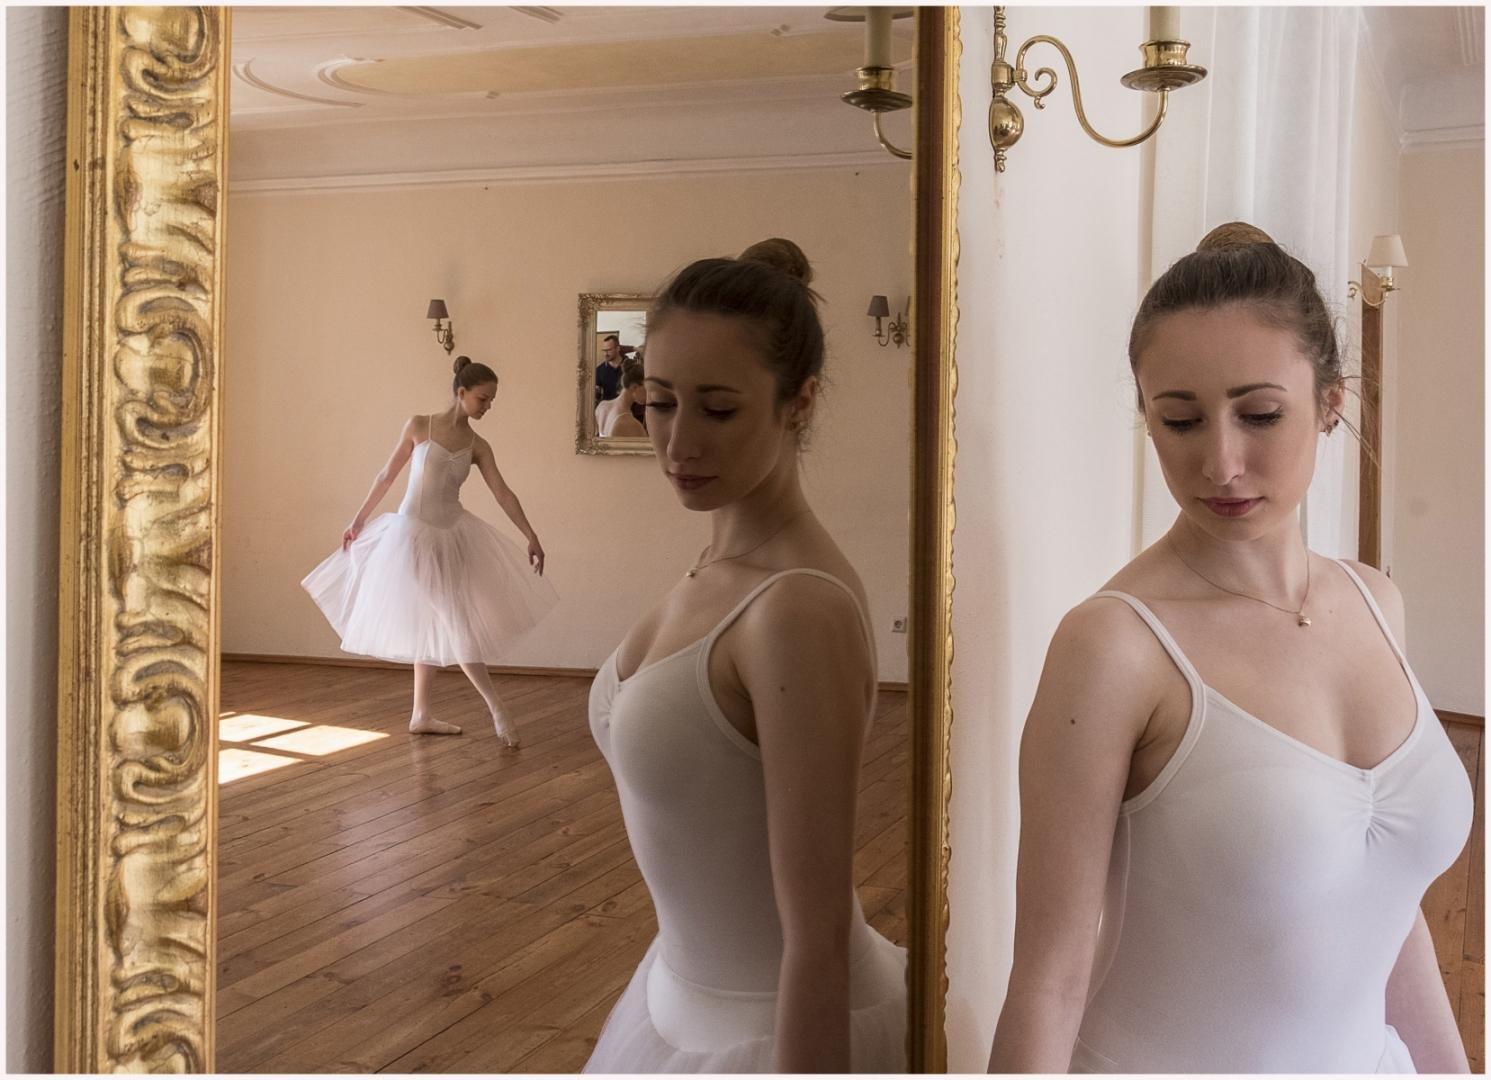 010-Ballett-250317